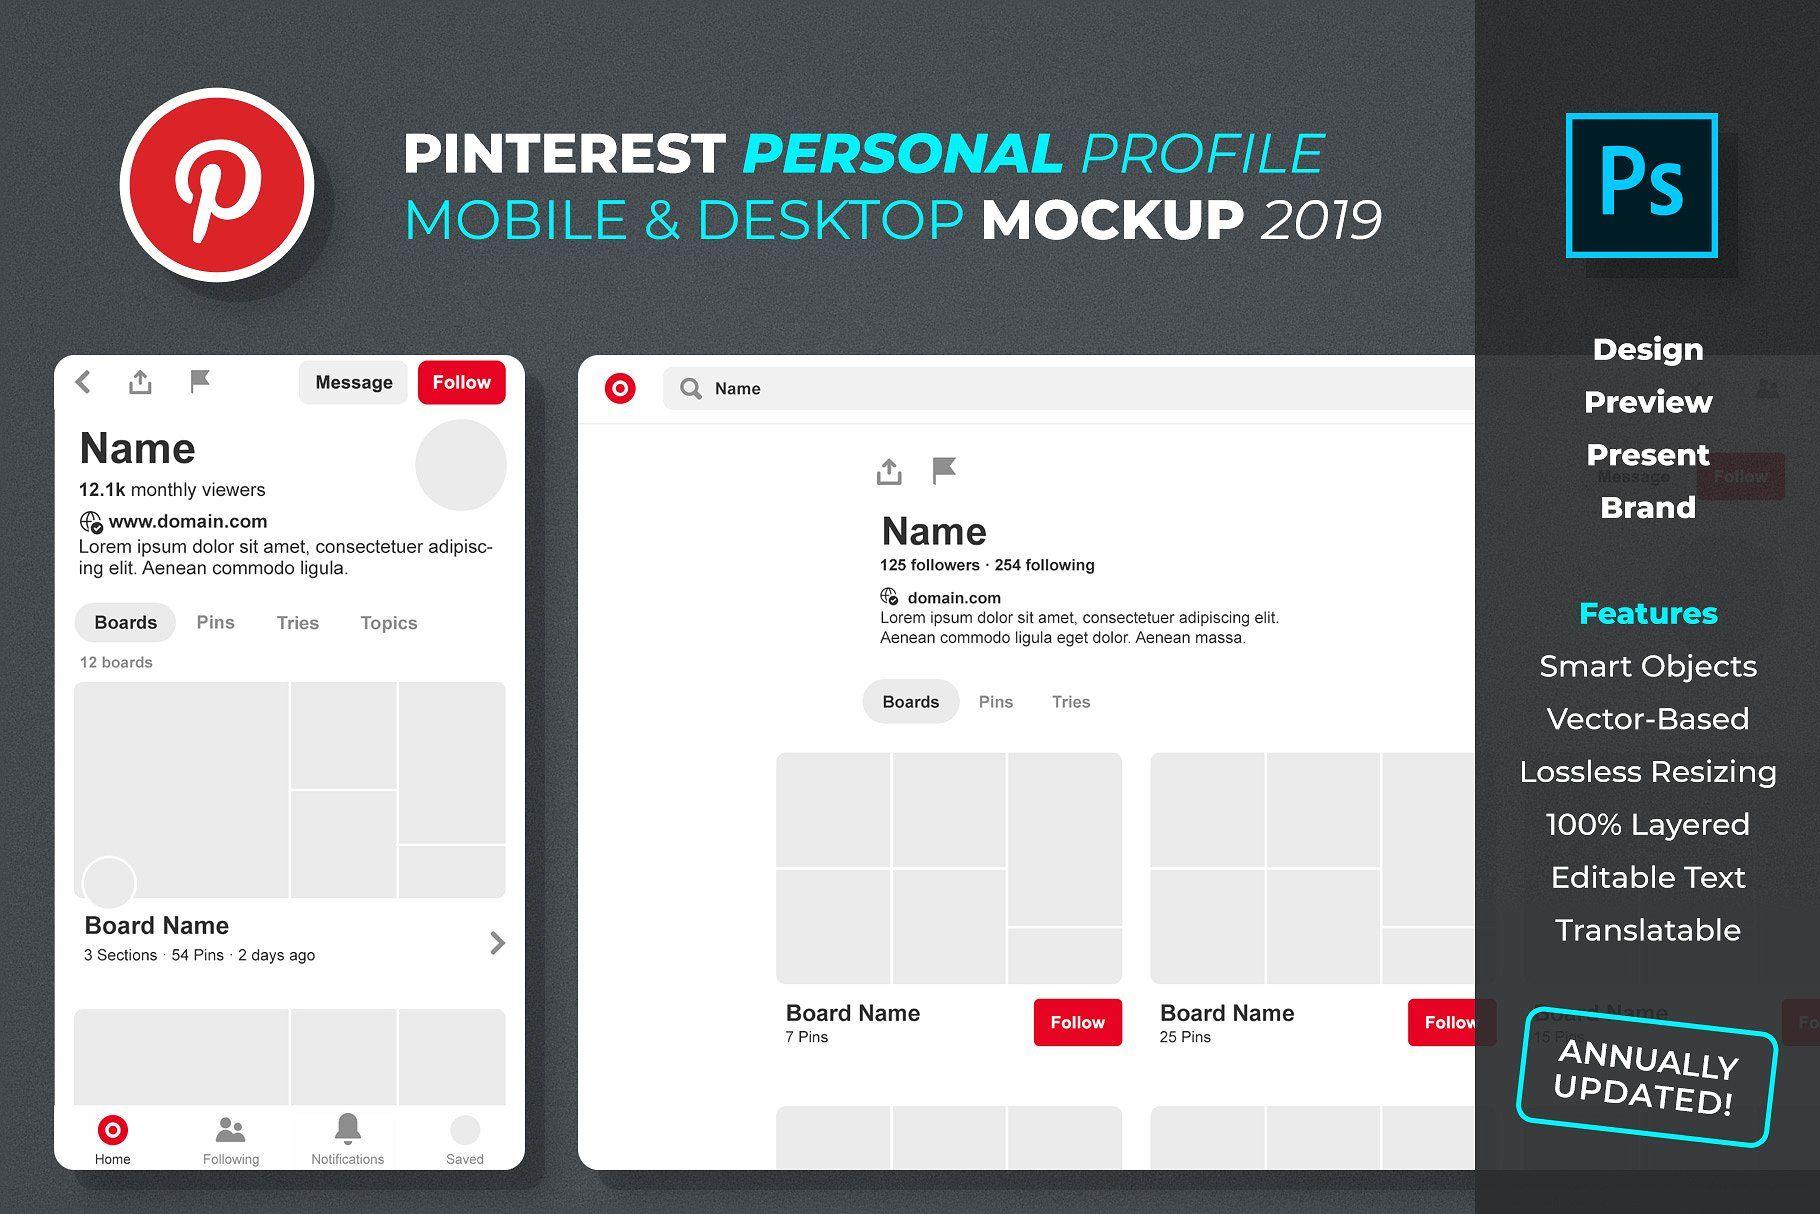 Pinterest Personal Profile Mockup